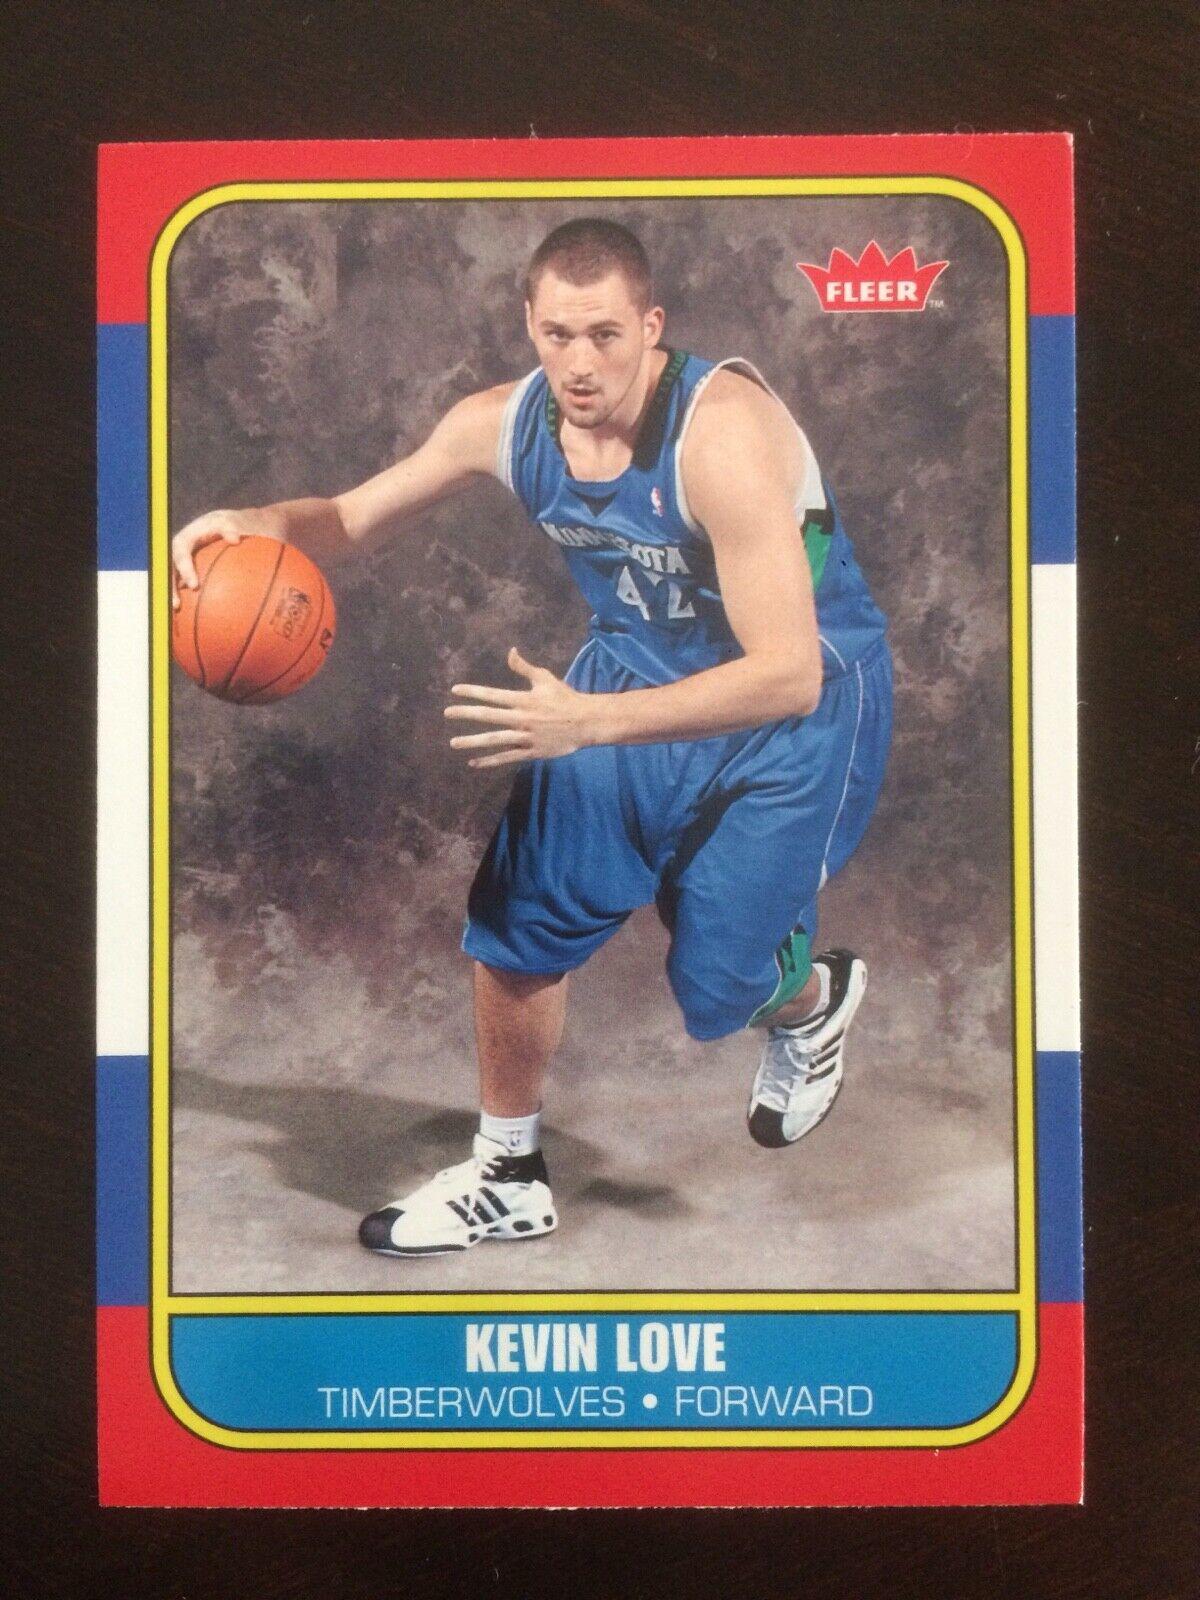 2008-09 Fleer 86R-167 Kevin Love ROOKIE, Sharp Centered  - $1.00